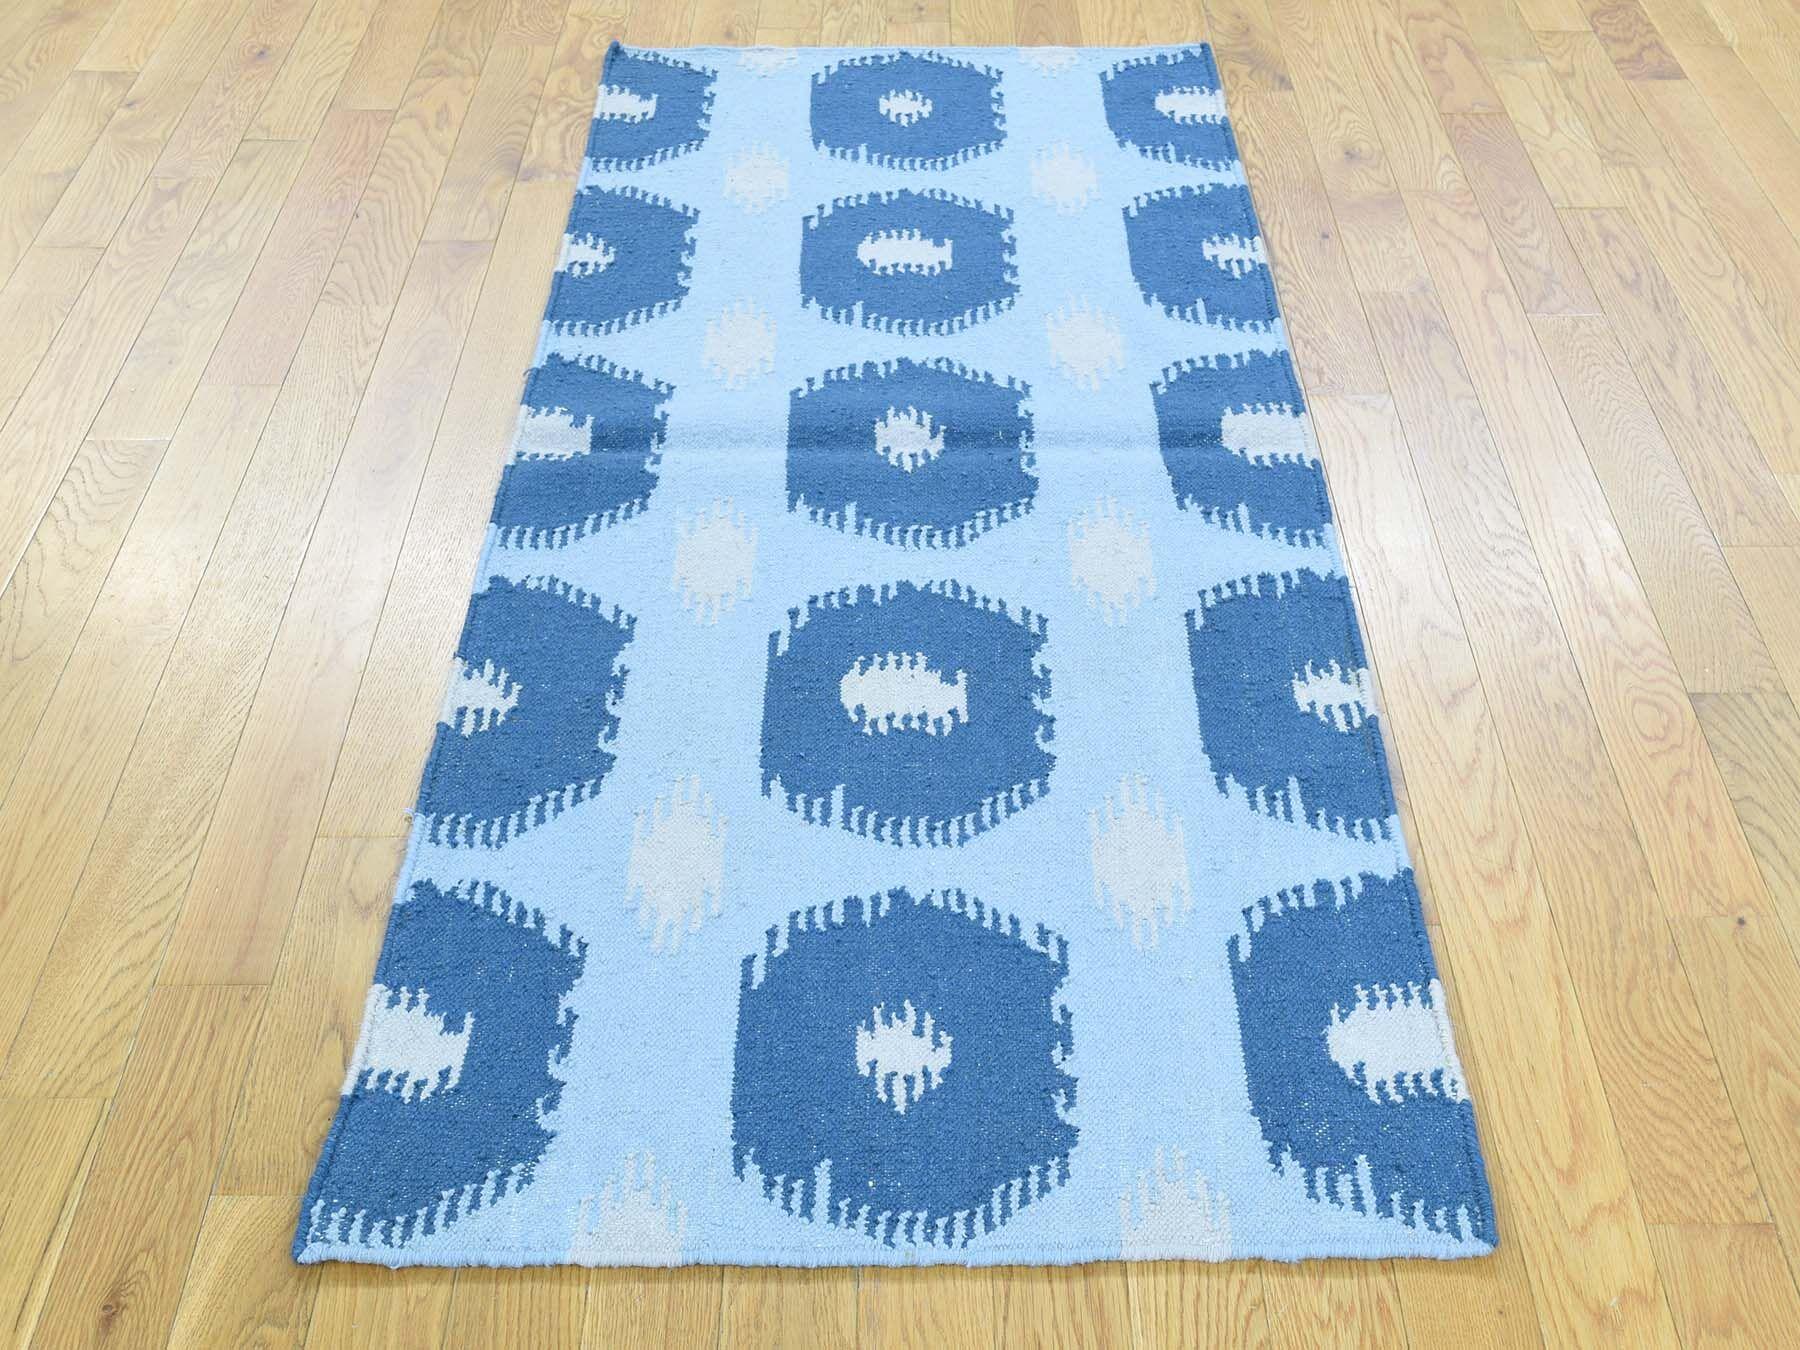 One-of-a-Kind Brawner Geometric Design Reversible Handmade Kilim Blue Wool Area Rug